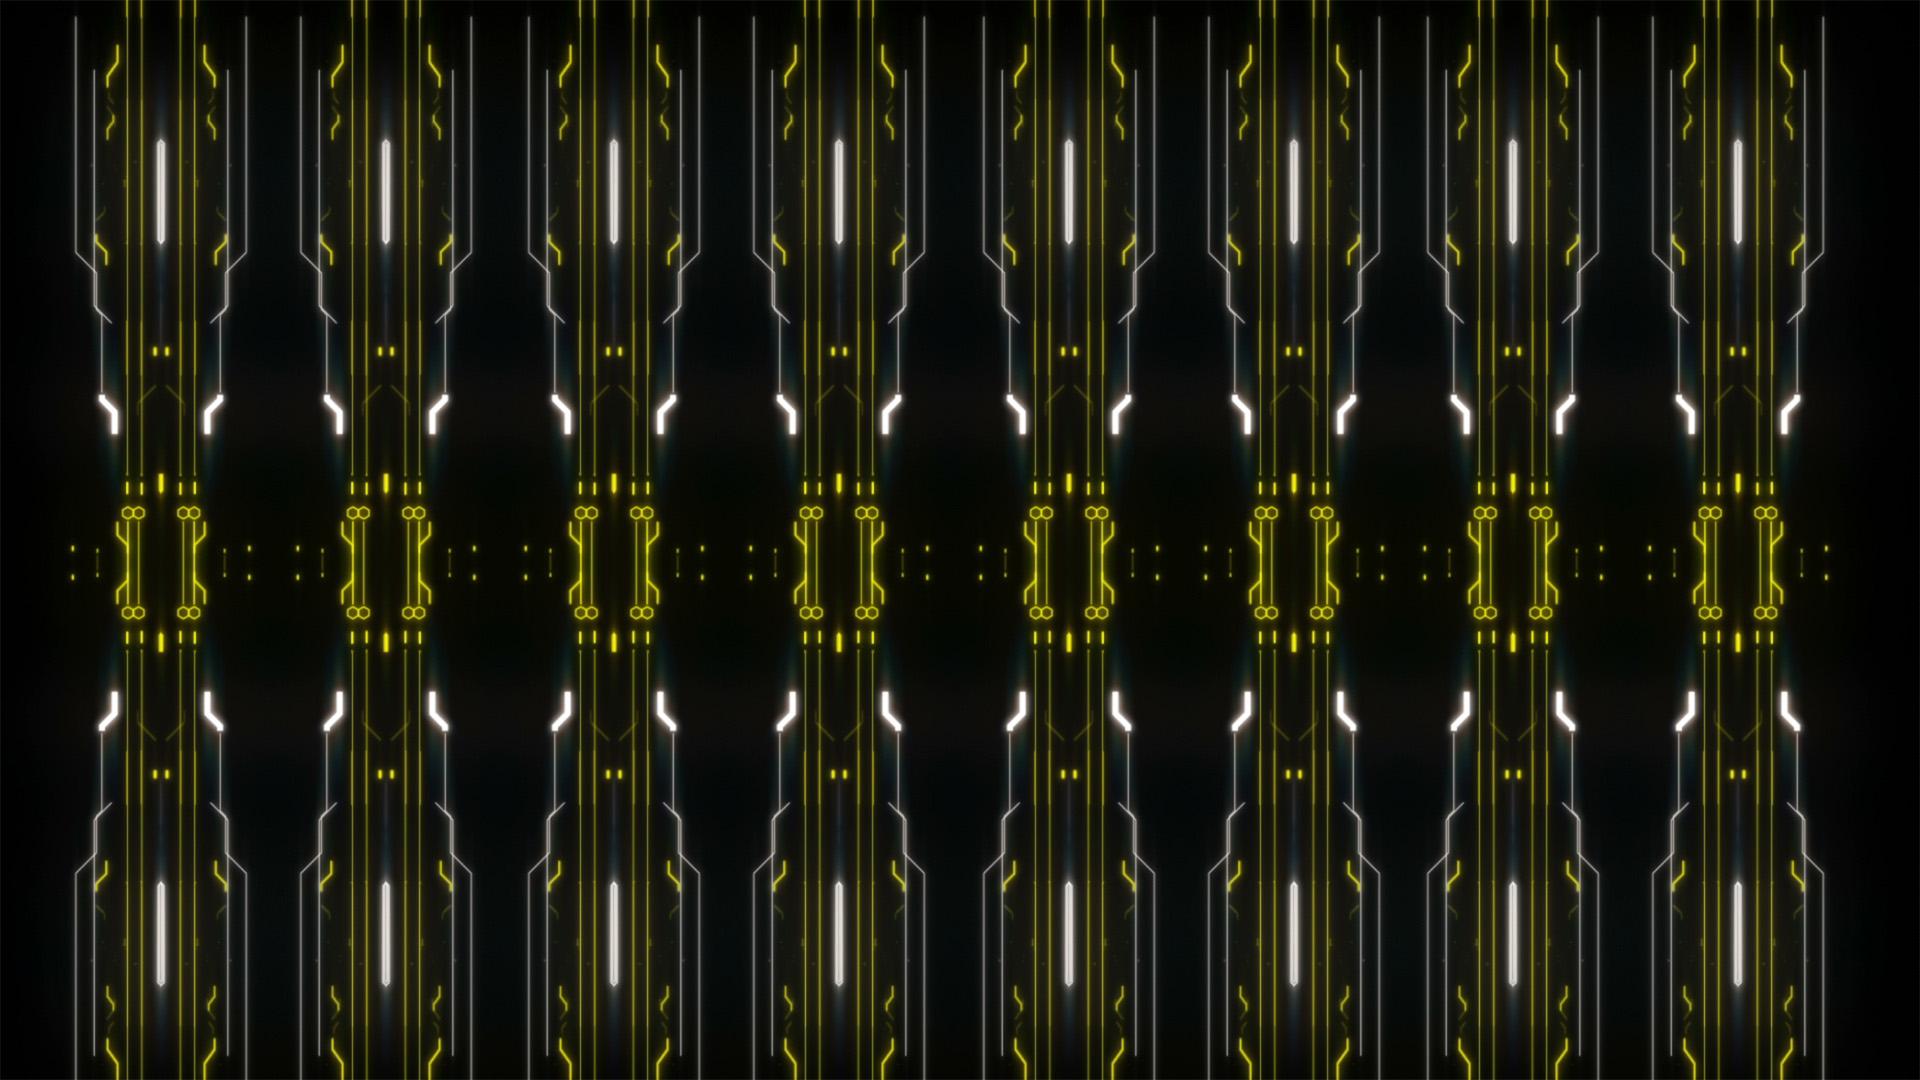 Artificial Intelligence columns